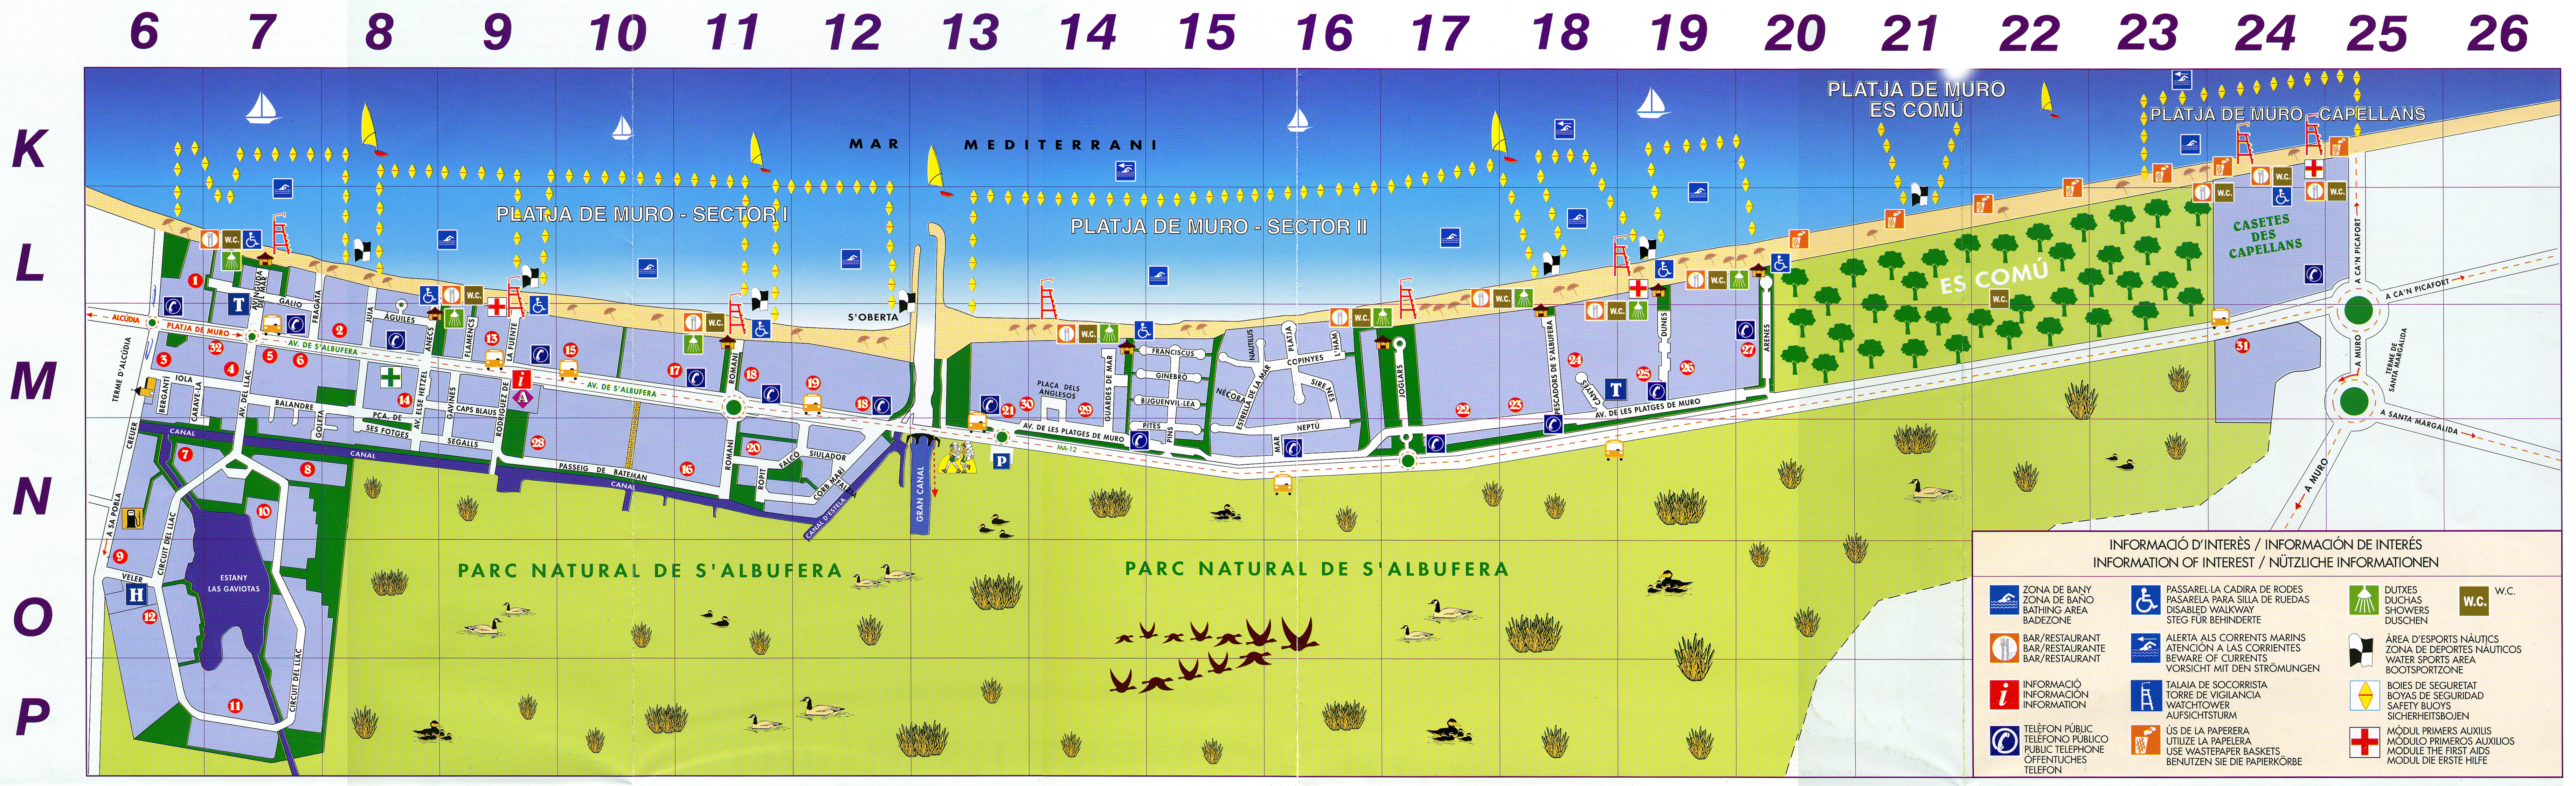 playa de muro karte Karte Mallorca Playa De Muro | Kleve Landkarte